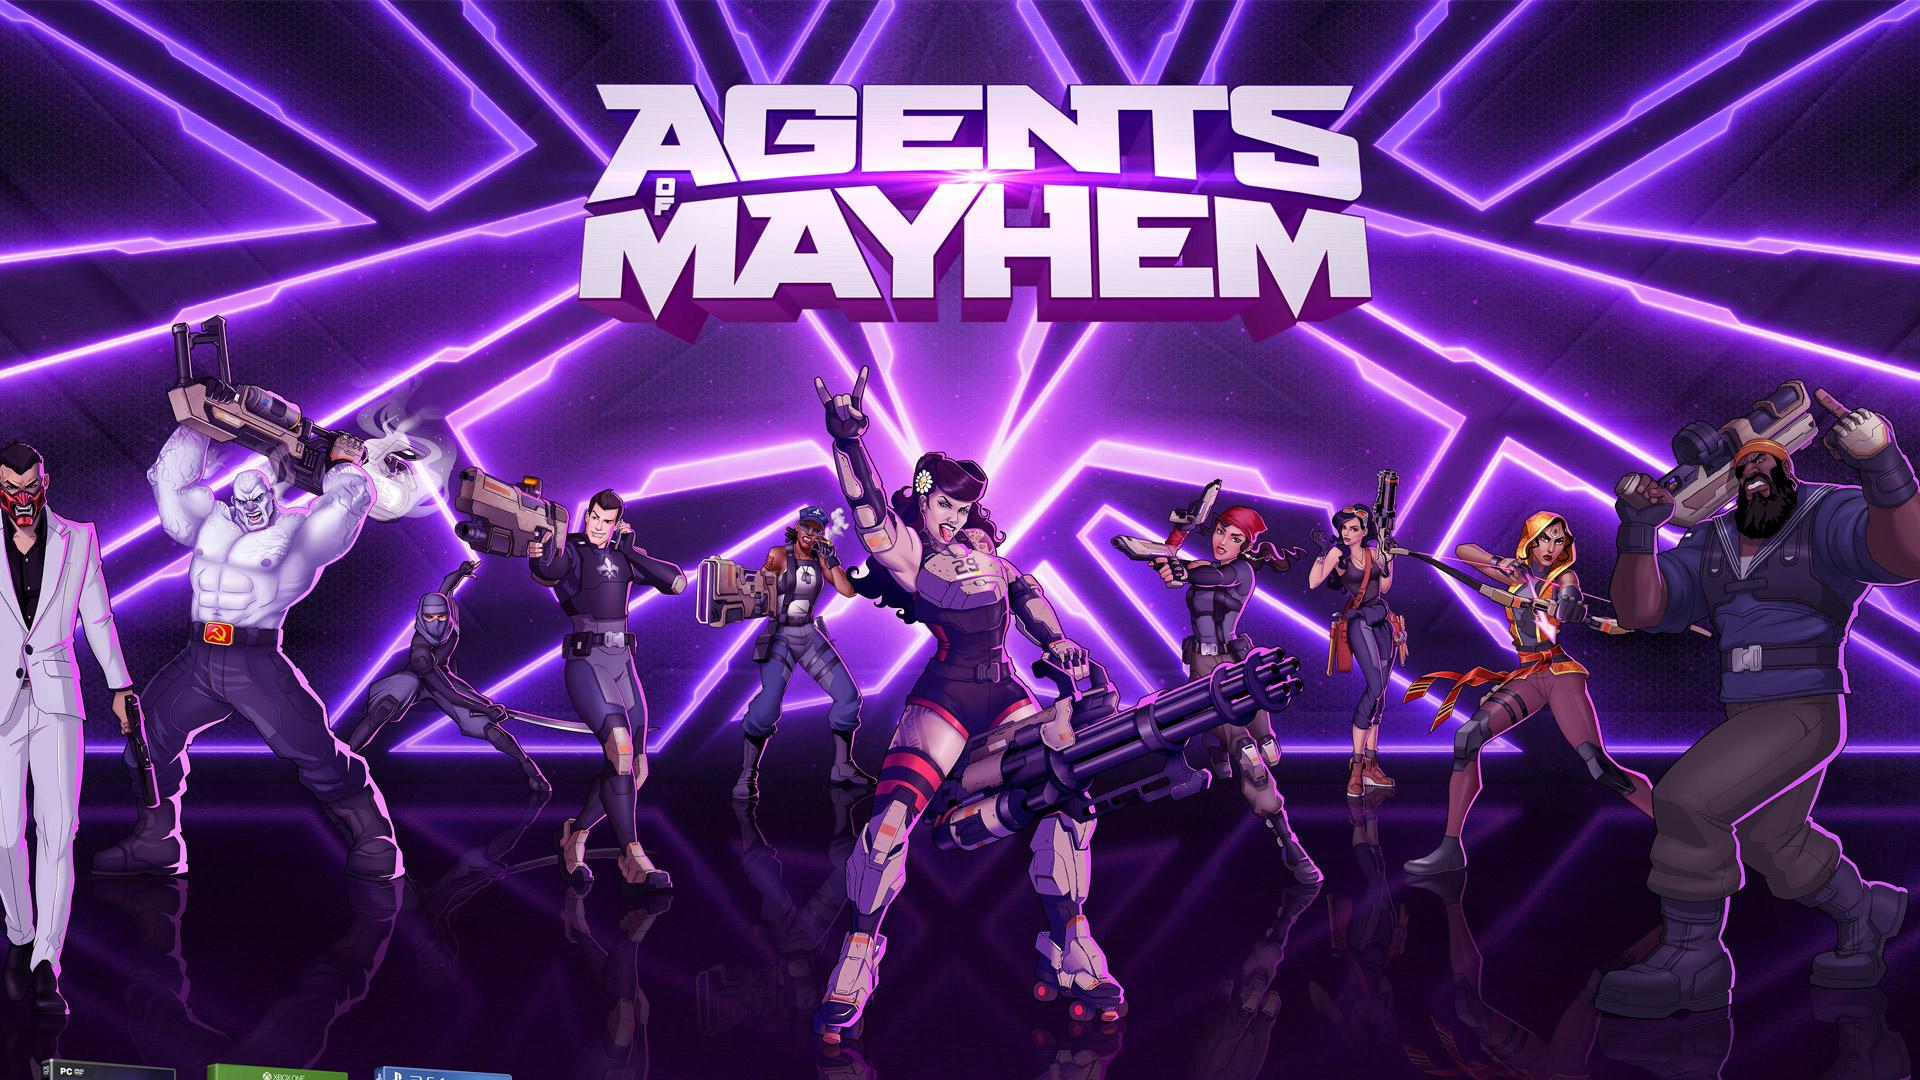 Free Agents of Mayhem Wallpaper in 1920x1080